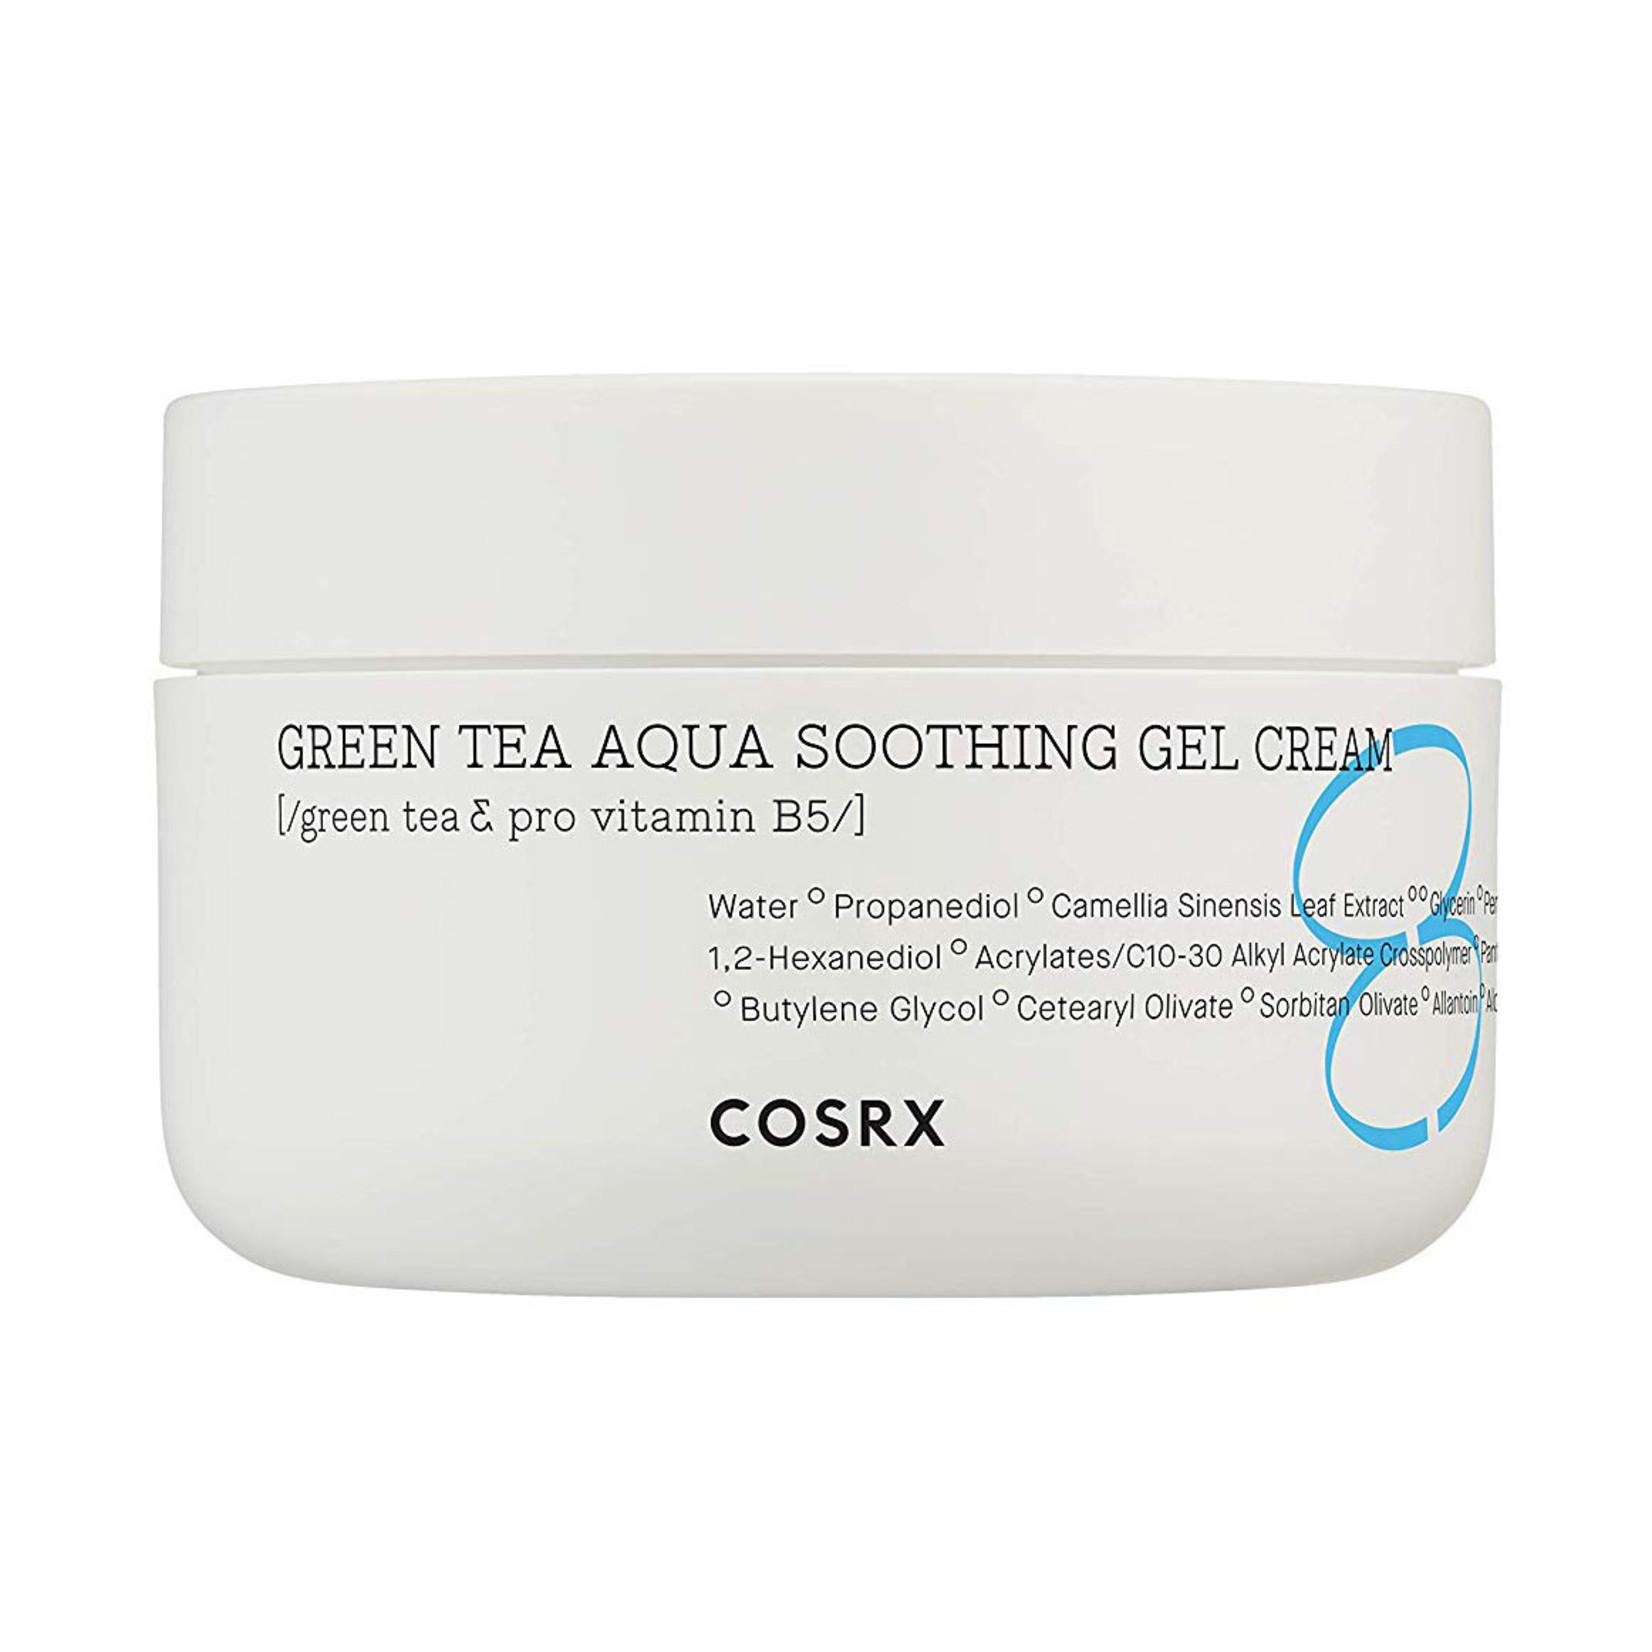 COSRX Hydrium Green Tea Aqua Soothing Gel Cream